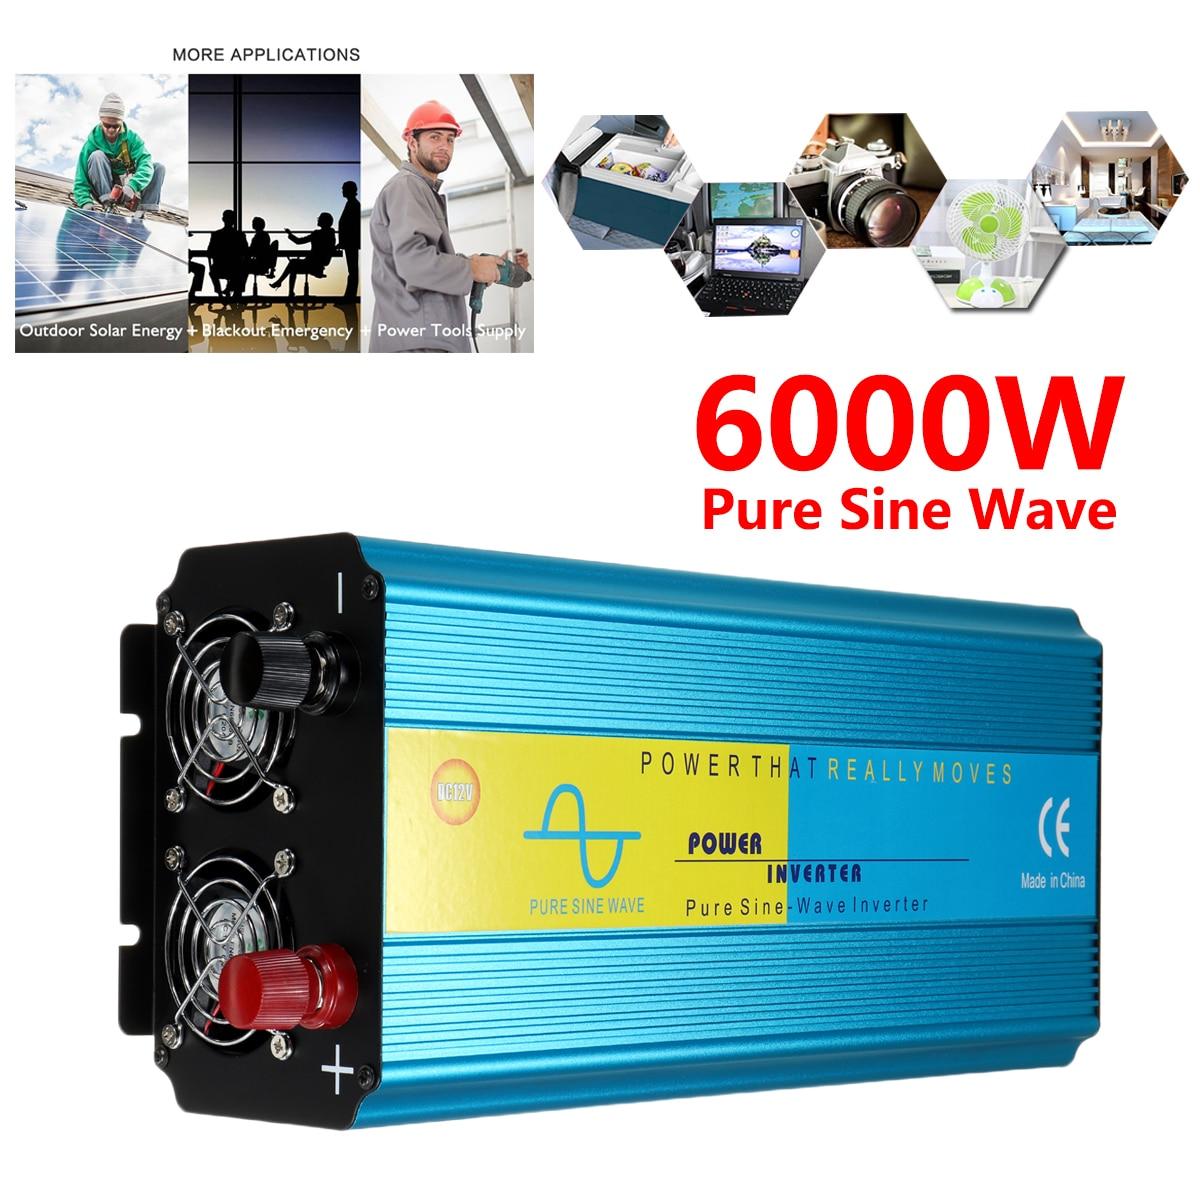 цена на PEAK 6000W Voltage Transformer Pure Sine Wave DC12/24V To 220V Caravan Watt Power Inverter Car Camping Insurance Intelligent